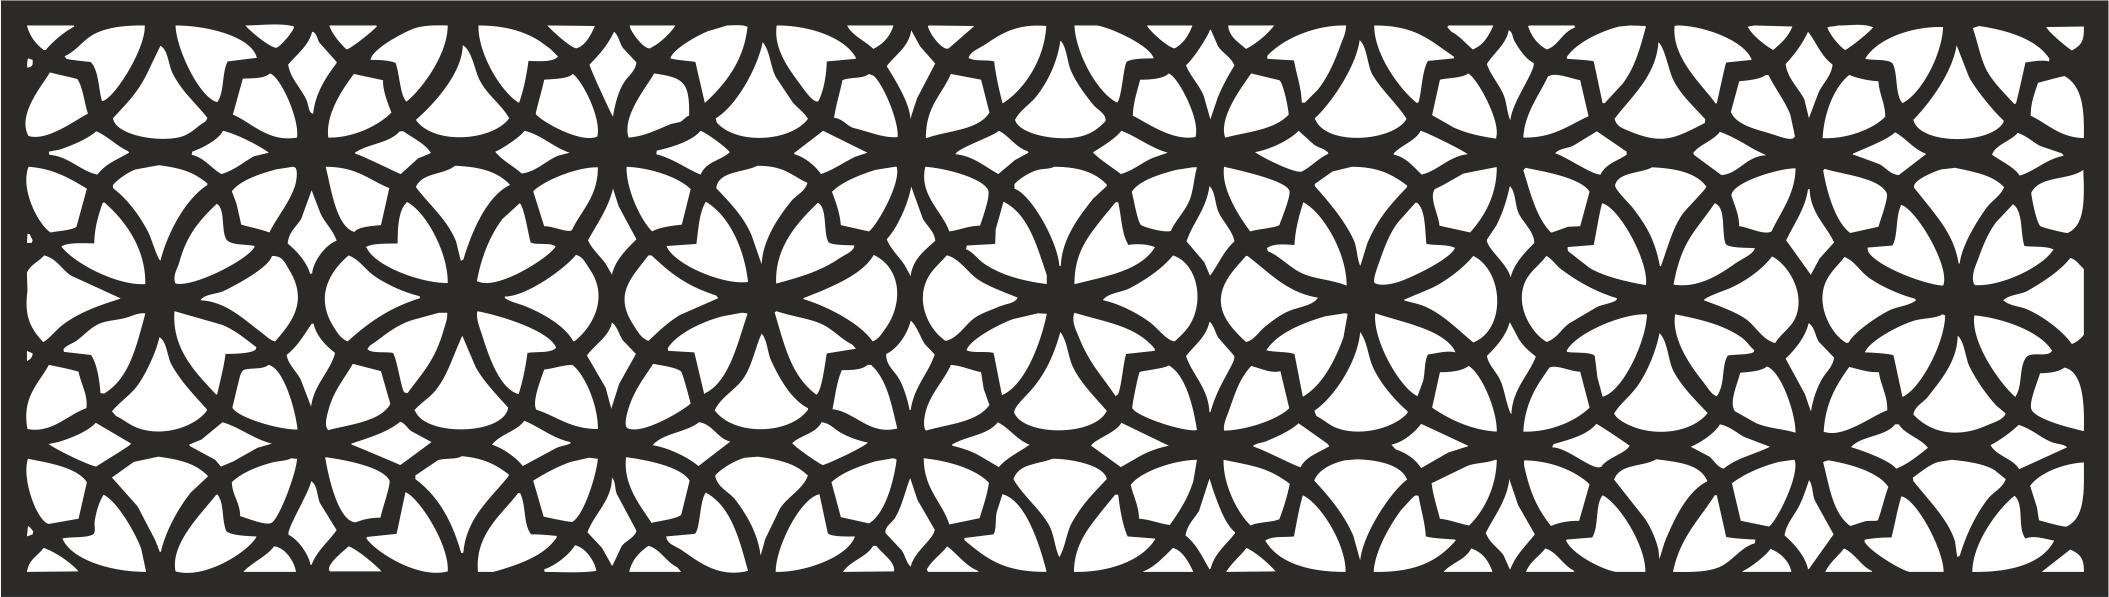 laser cut pattern template